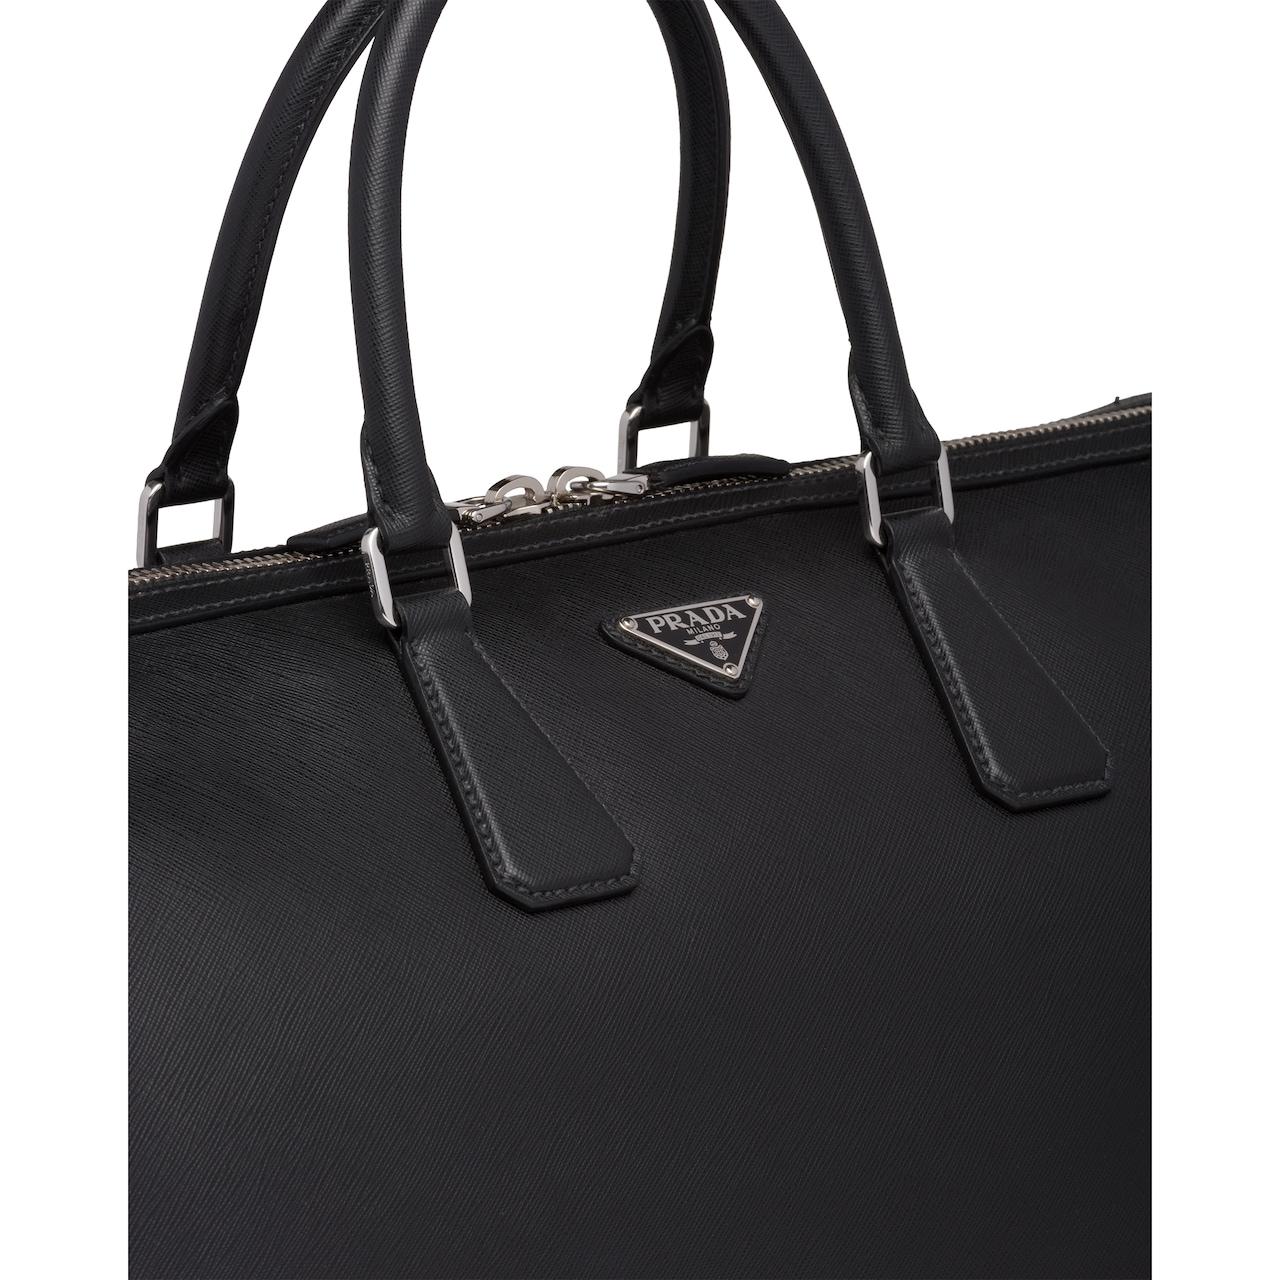 Prada Saffiano leather duffle bag 6